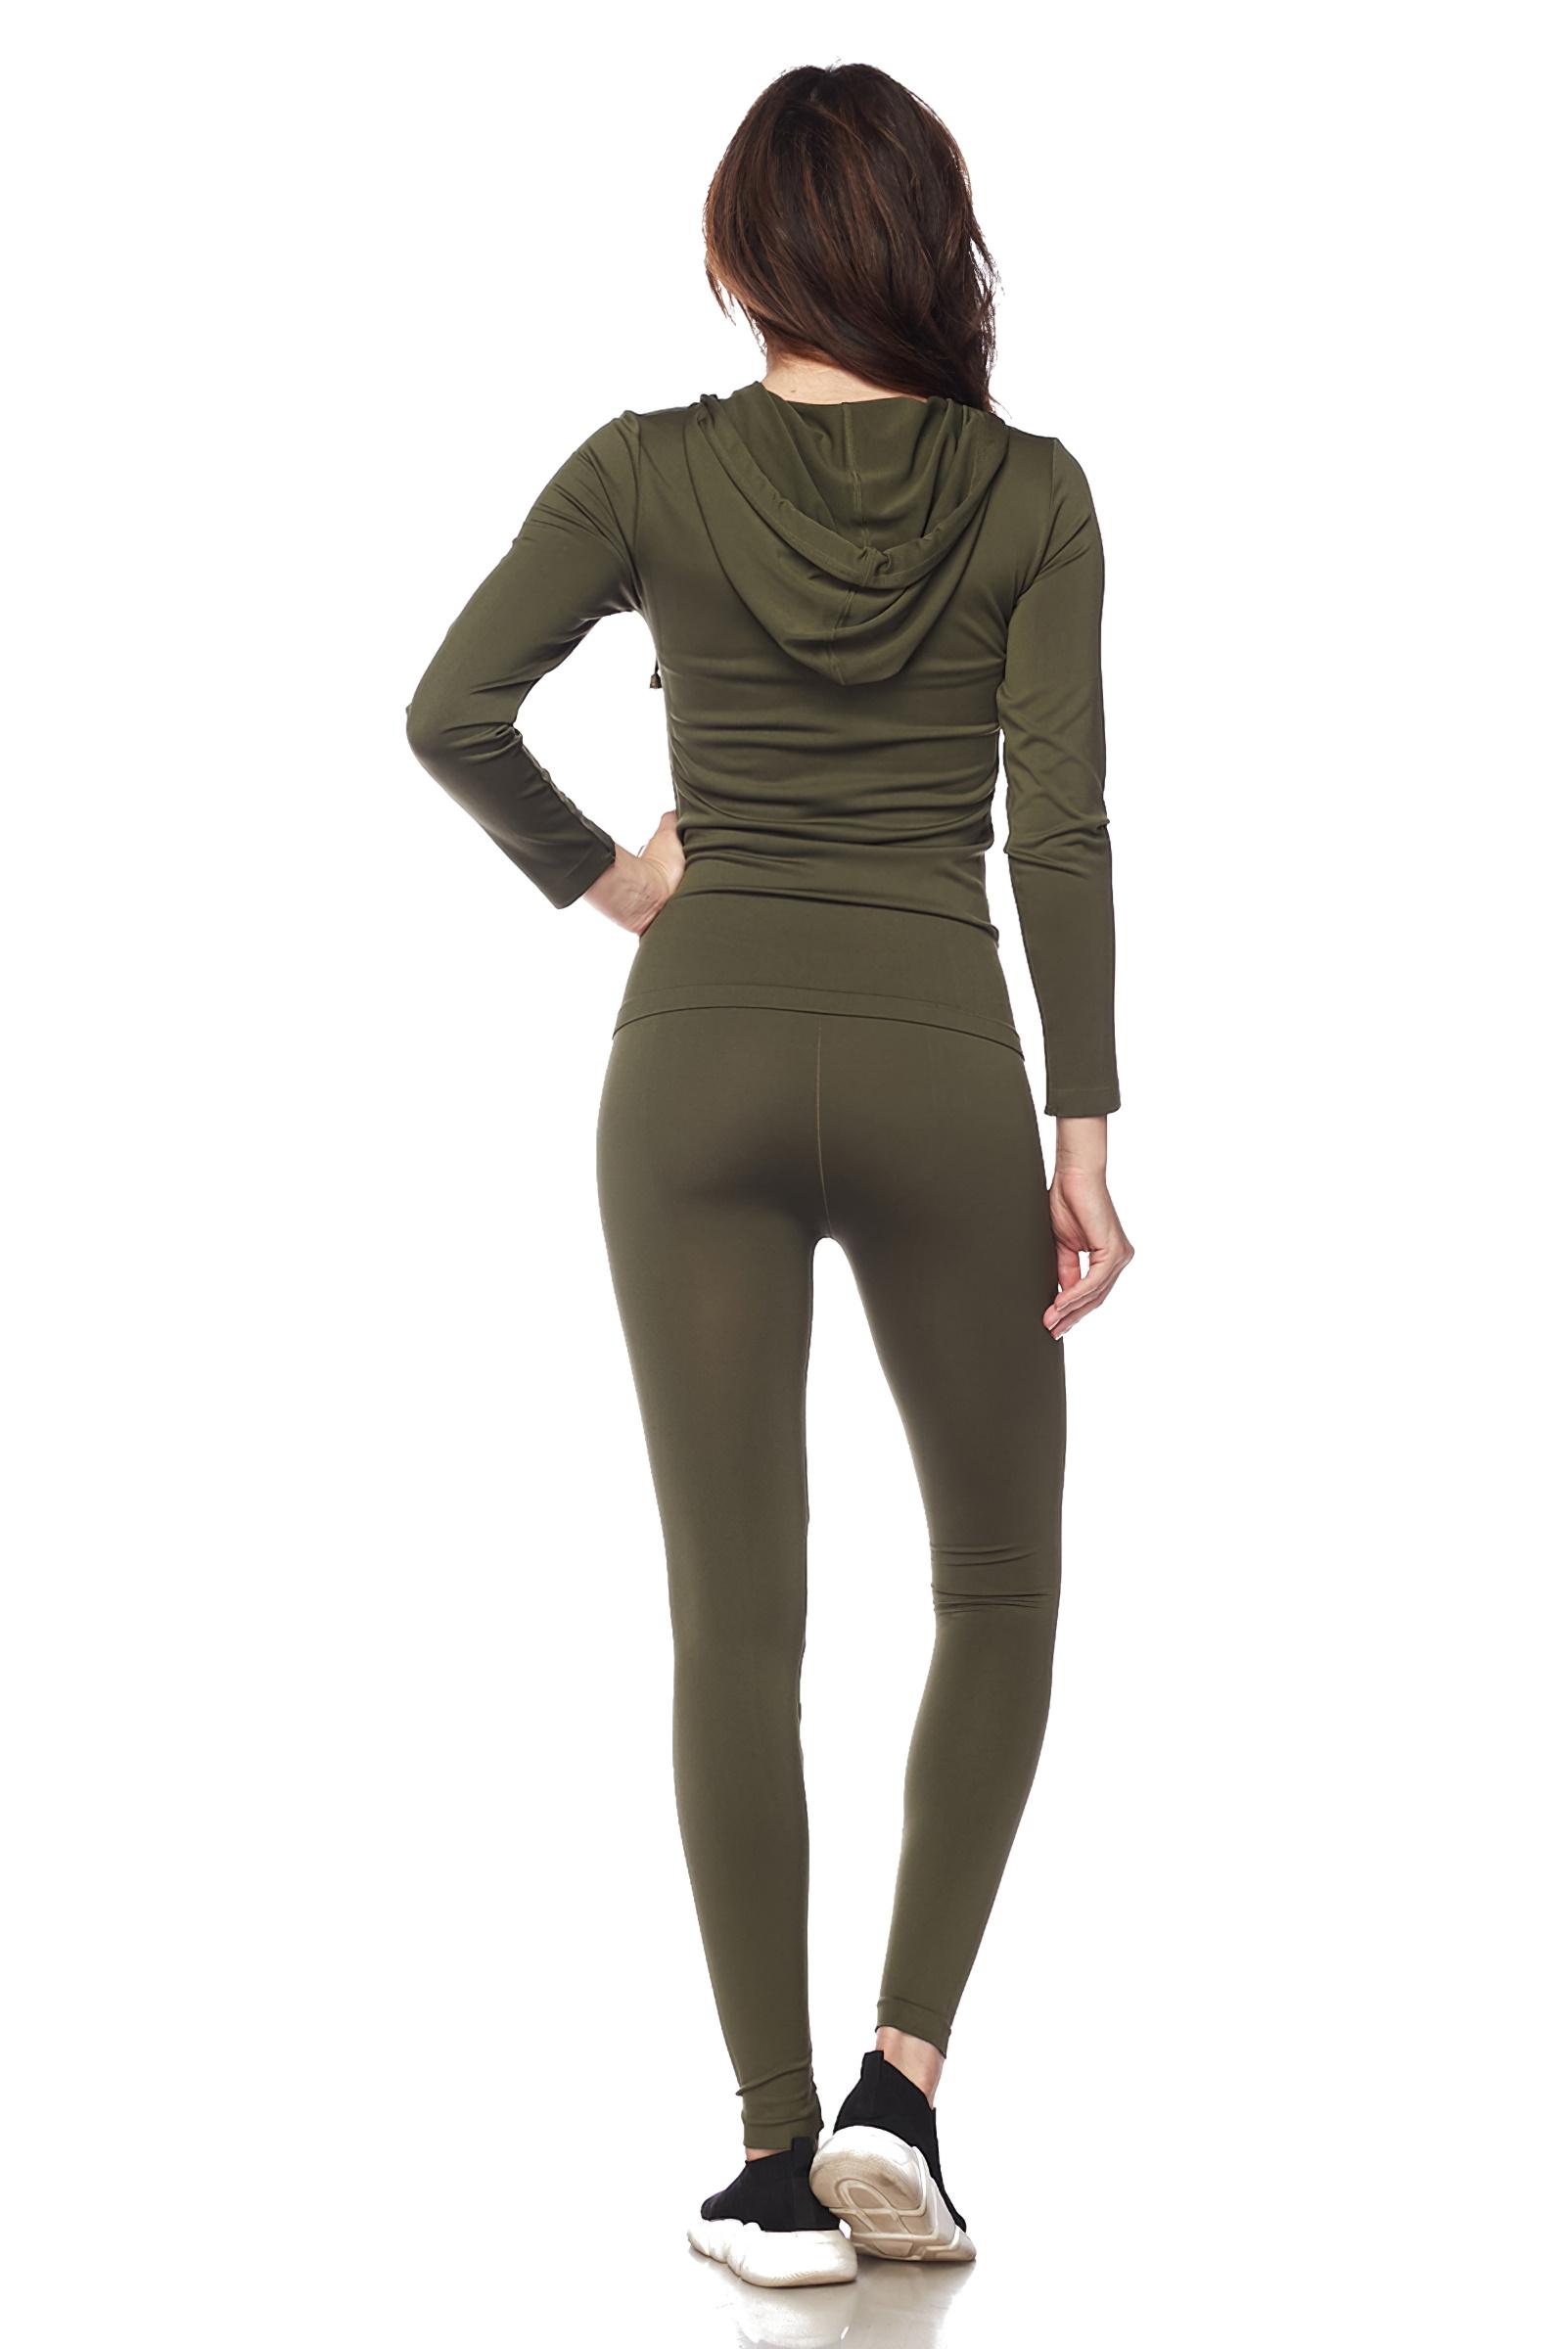 Women-039-s-Juniors-Active-Set-Wear-Zip-Up-Hoodie-and-Legging thumbnail 35